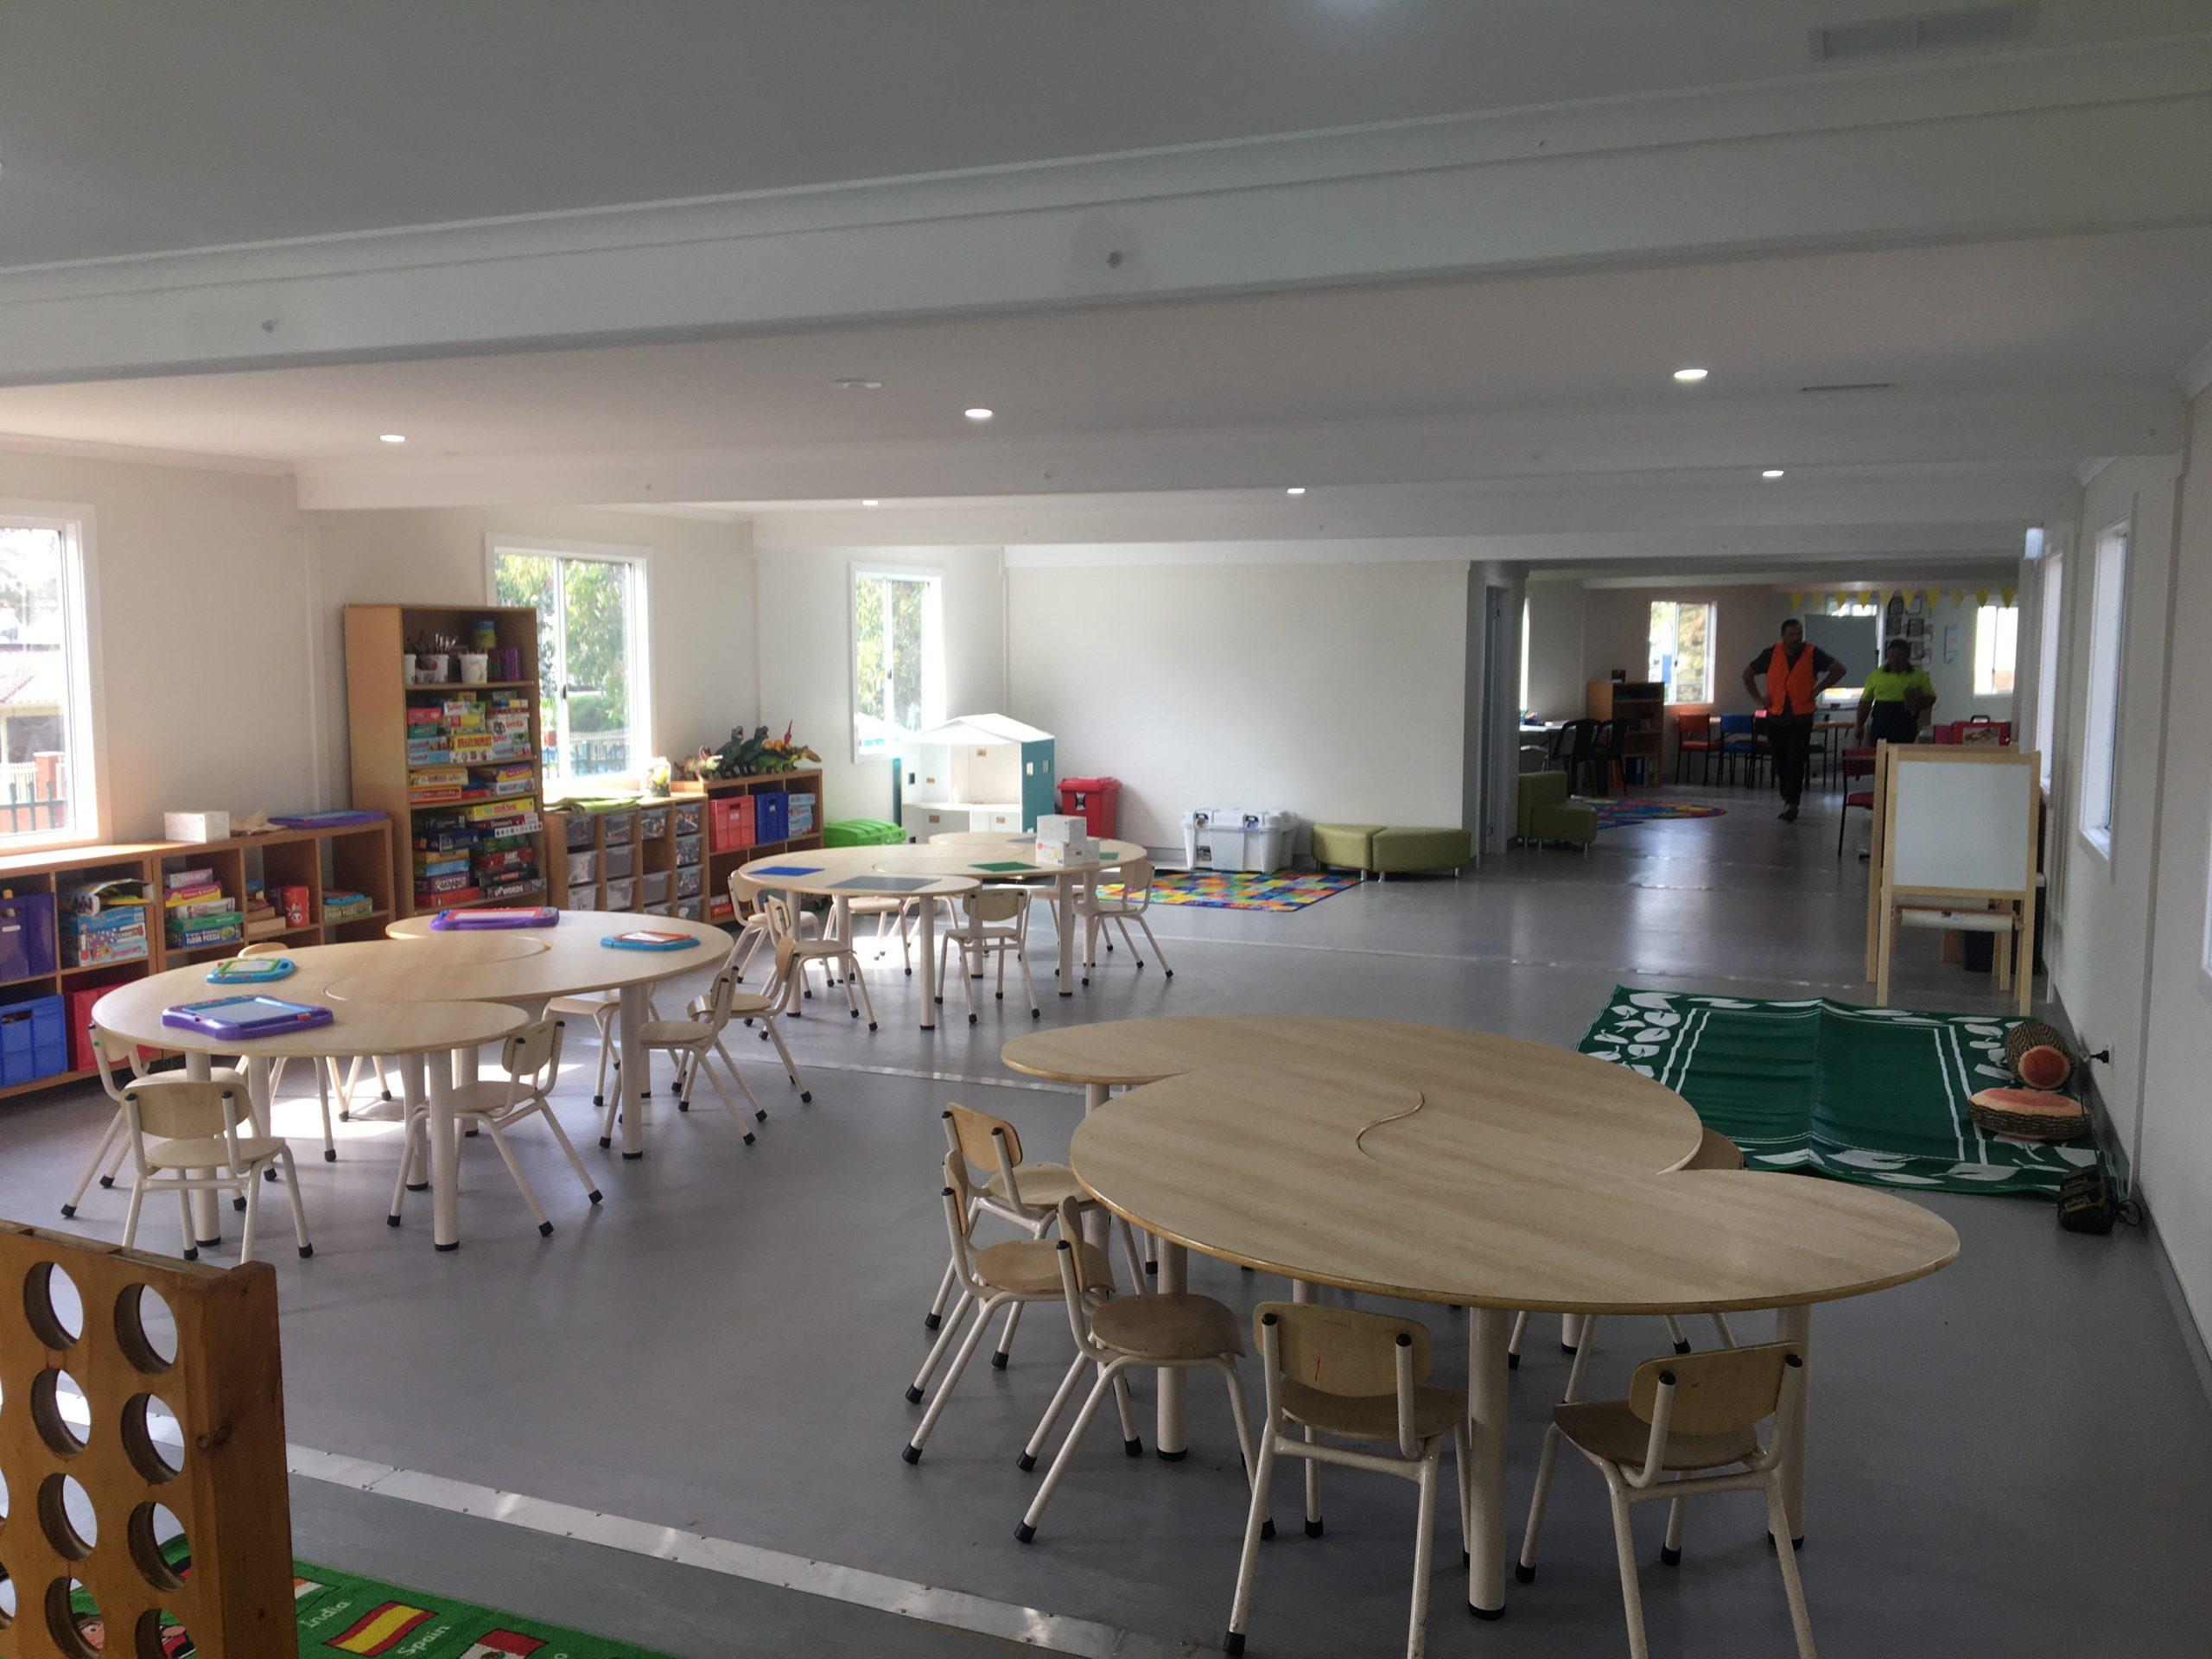 Demountable classroom interior